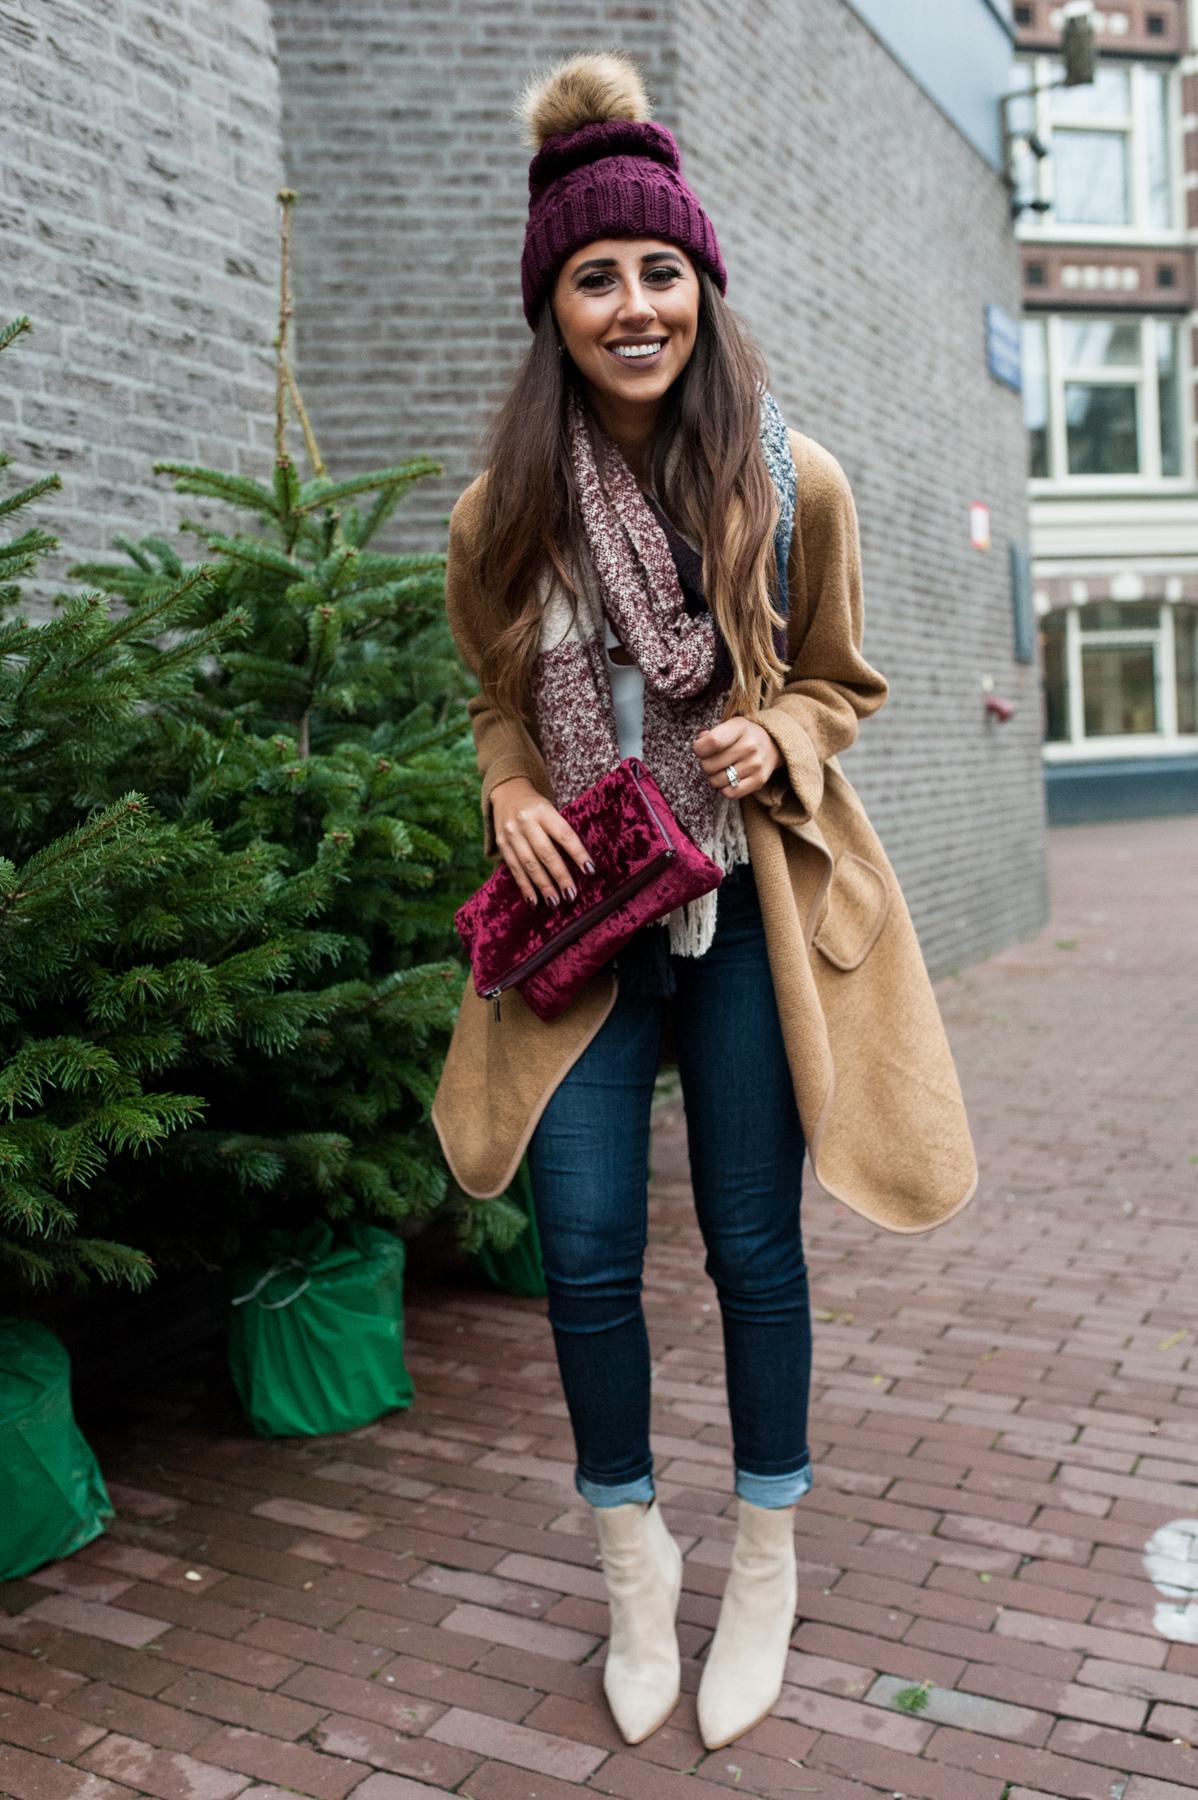 Winter Look In Amsterdam